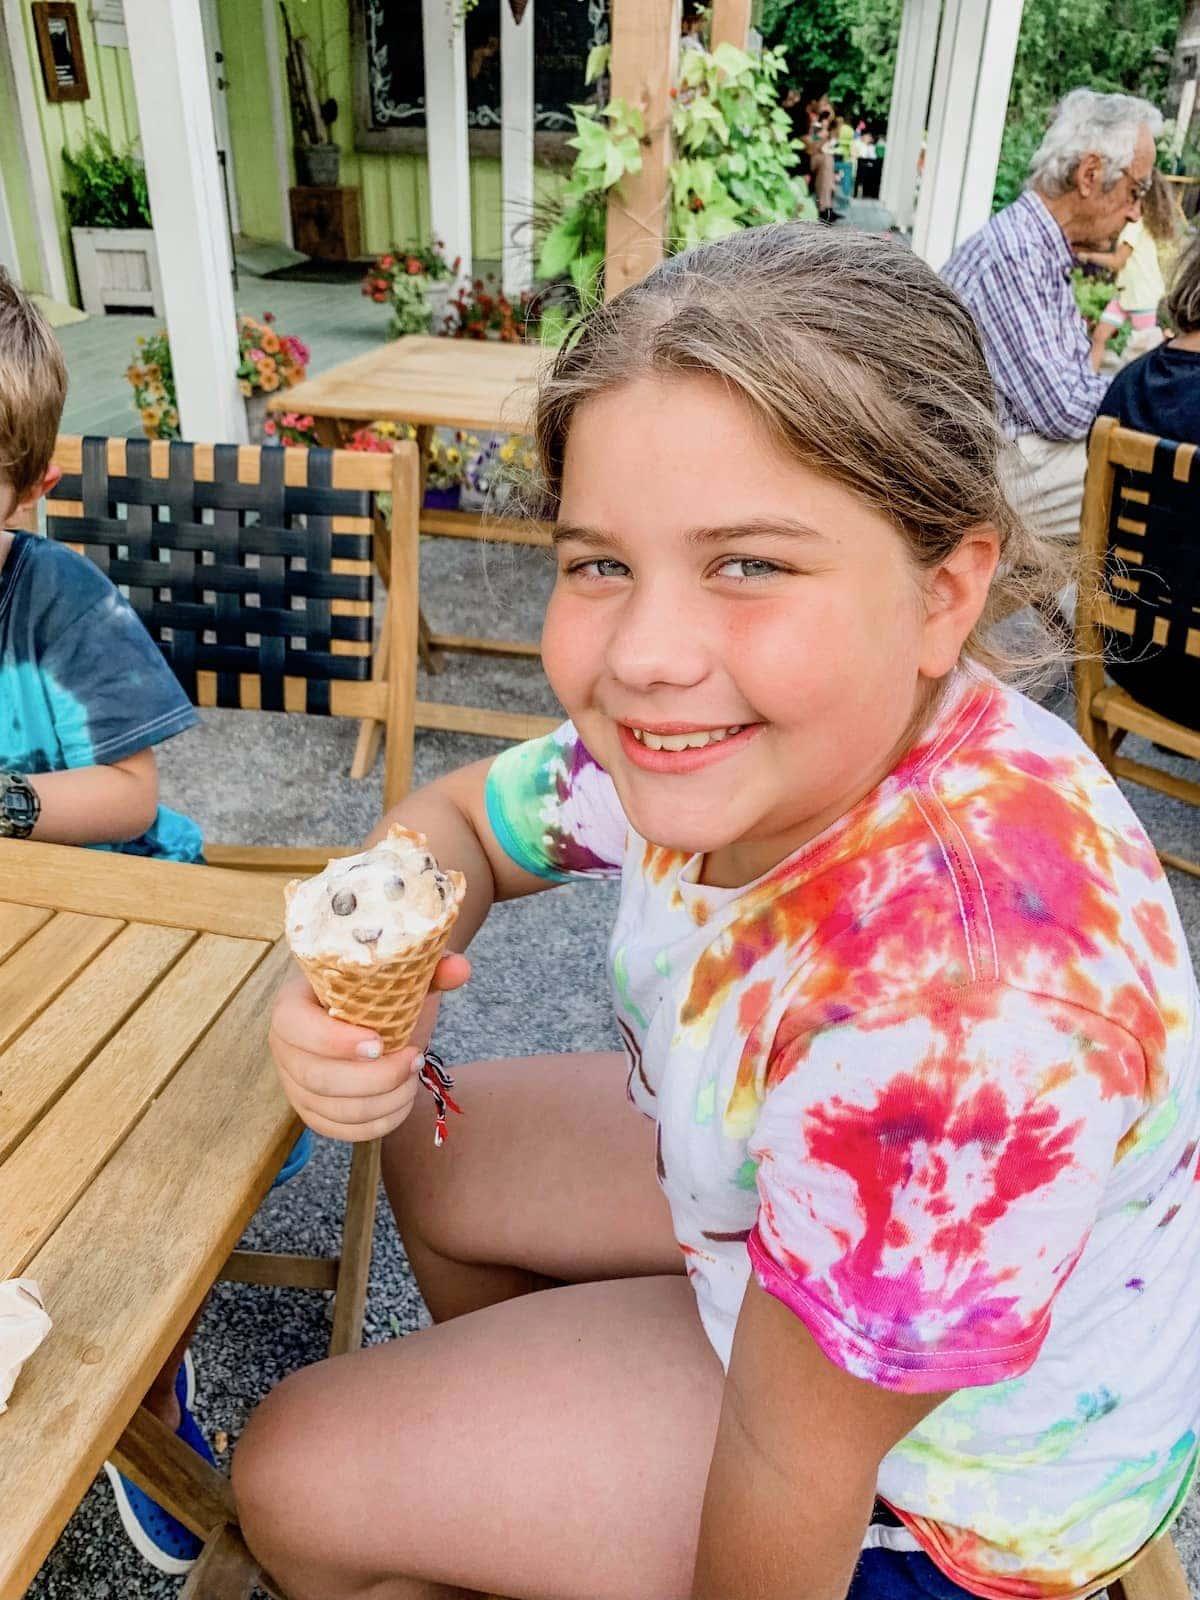 Brooke eating ice cream